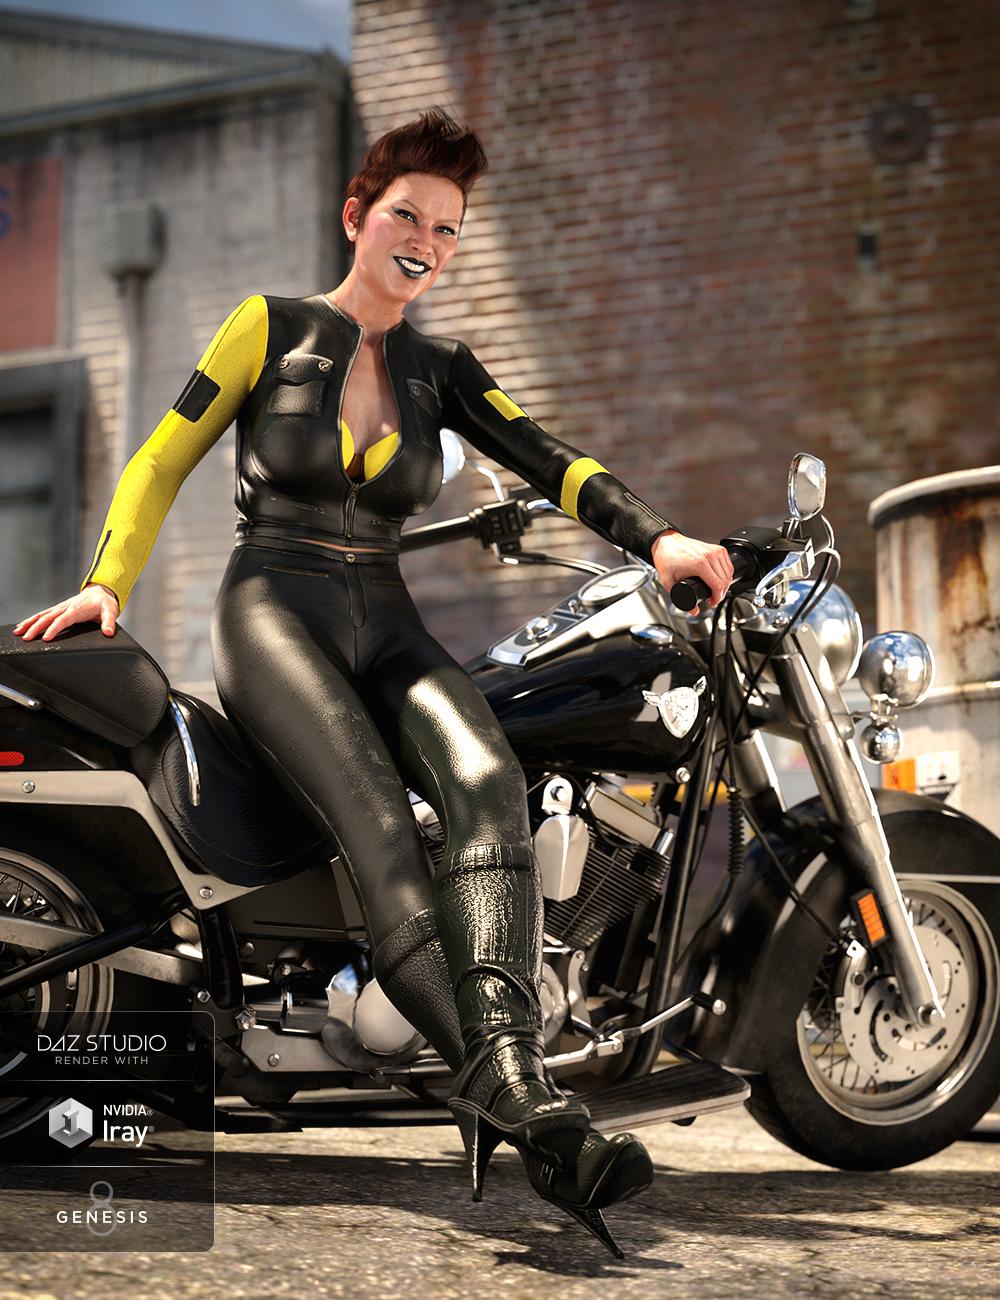 Moto Vixen Outfit for Genesis 8 Female(s) by: Anna BenjaminNikisatez, 3D Models by Daz 3D